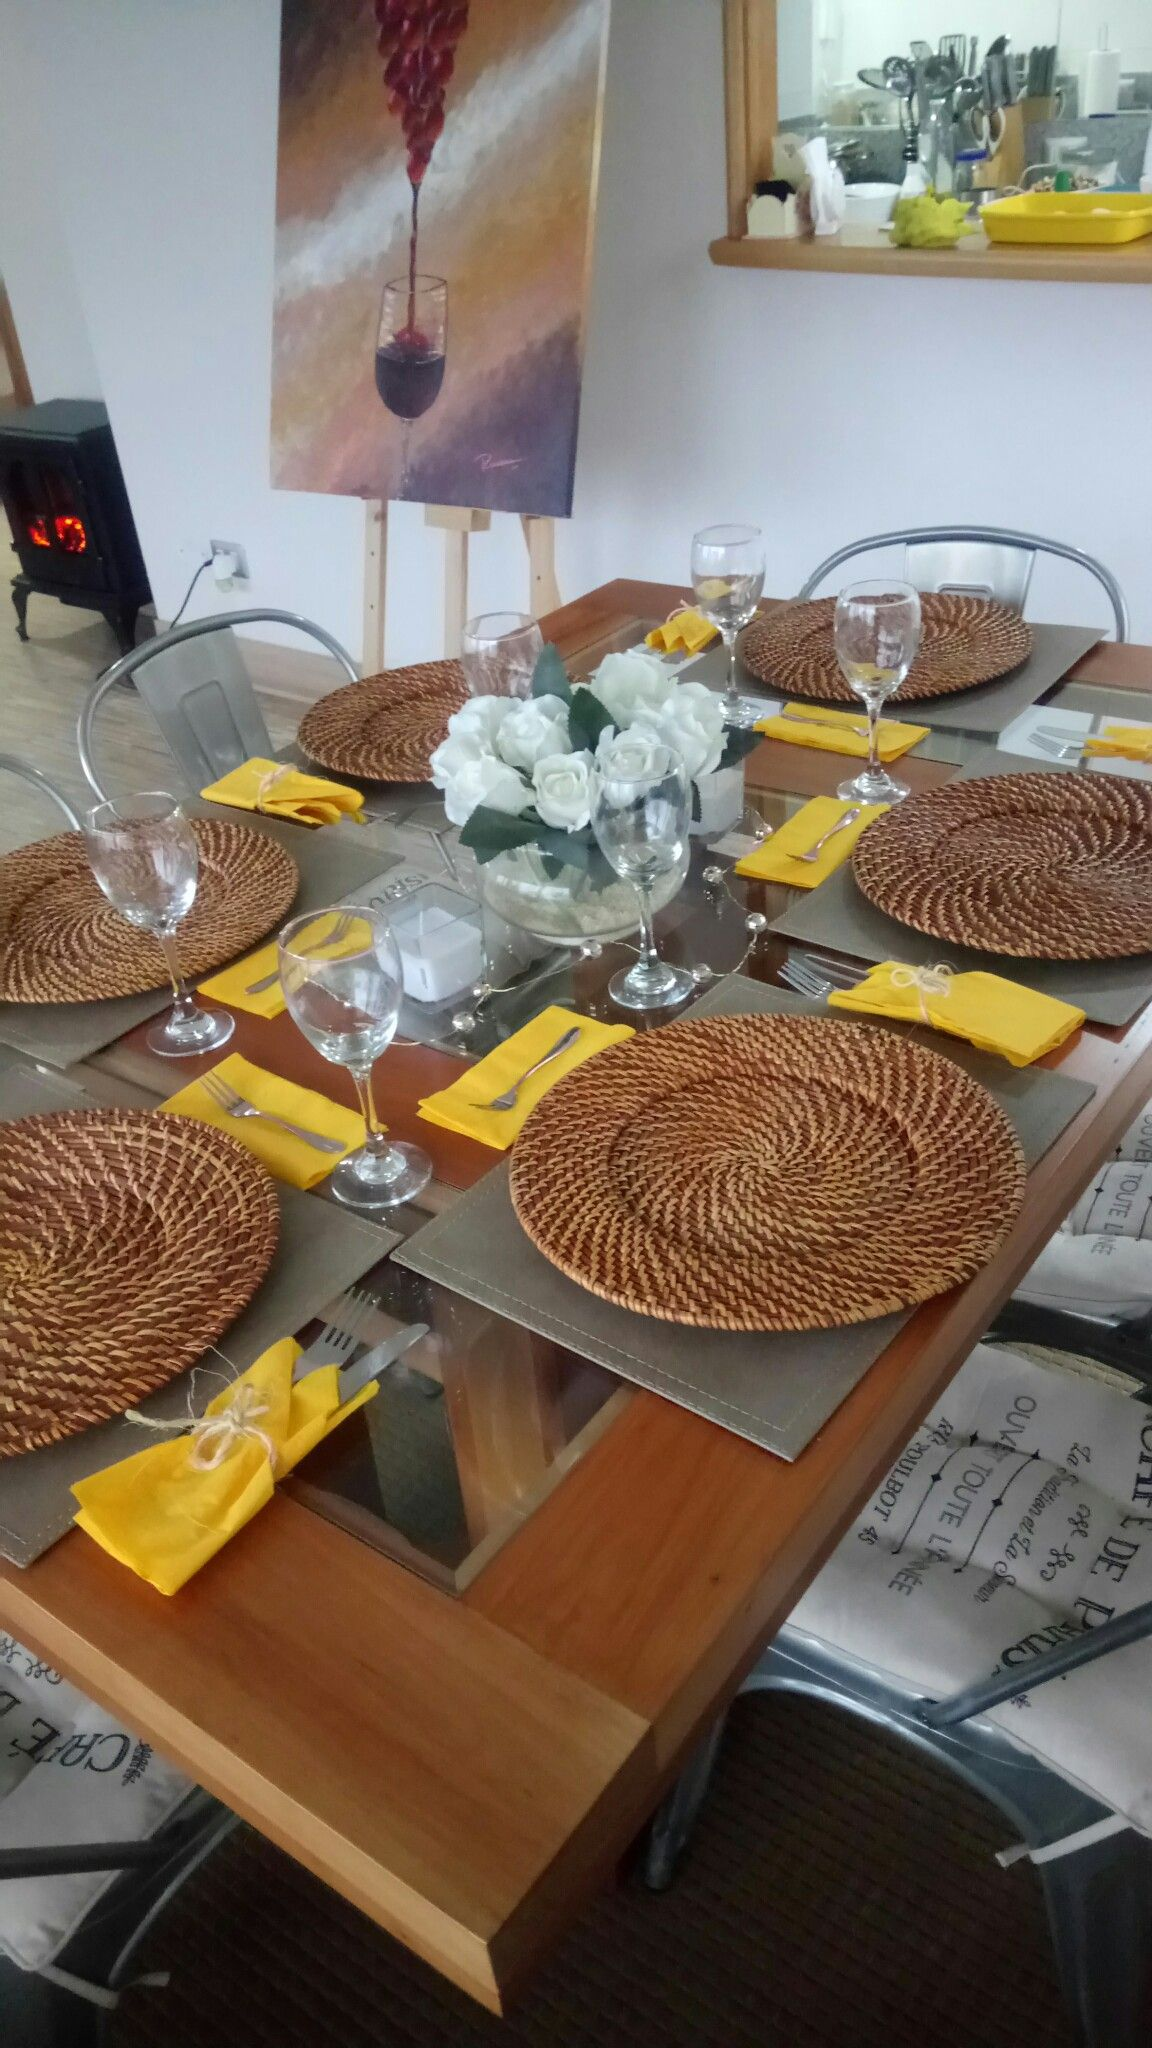 Decoraci n mesa para cena con amigos posa platos de - Ideas cena amigos ...